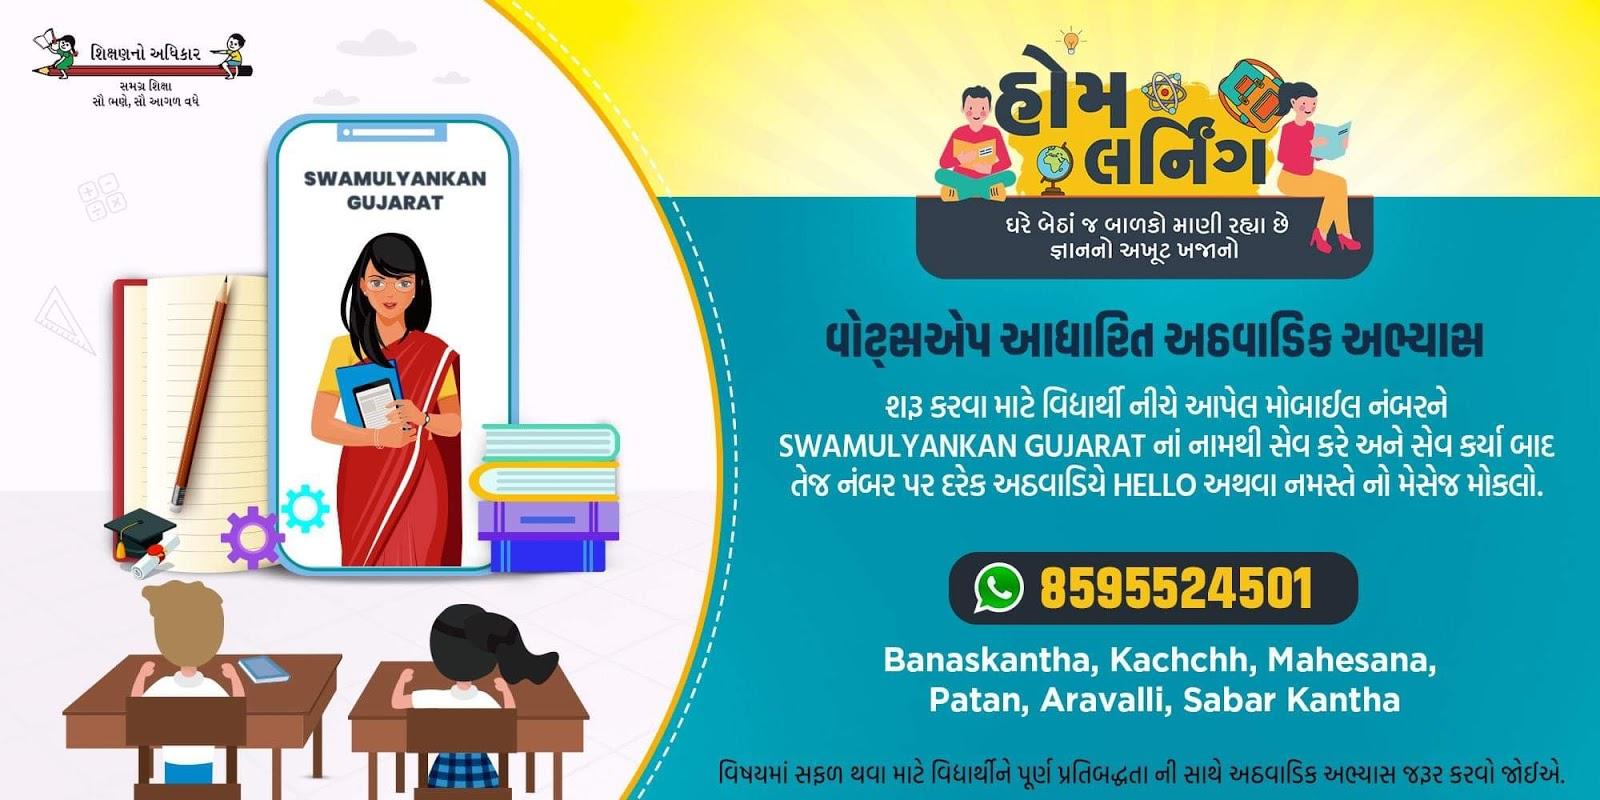 https://project303.blogspot.com/2021/01/home-learning-whatsapp-exam.html